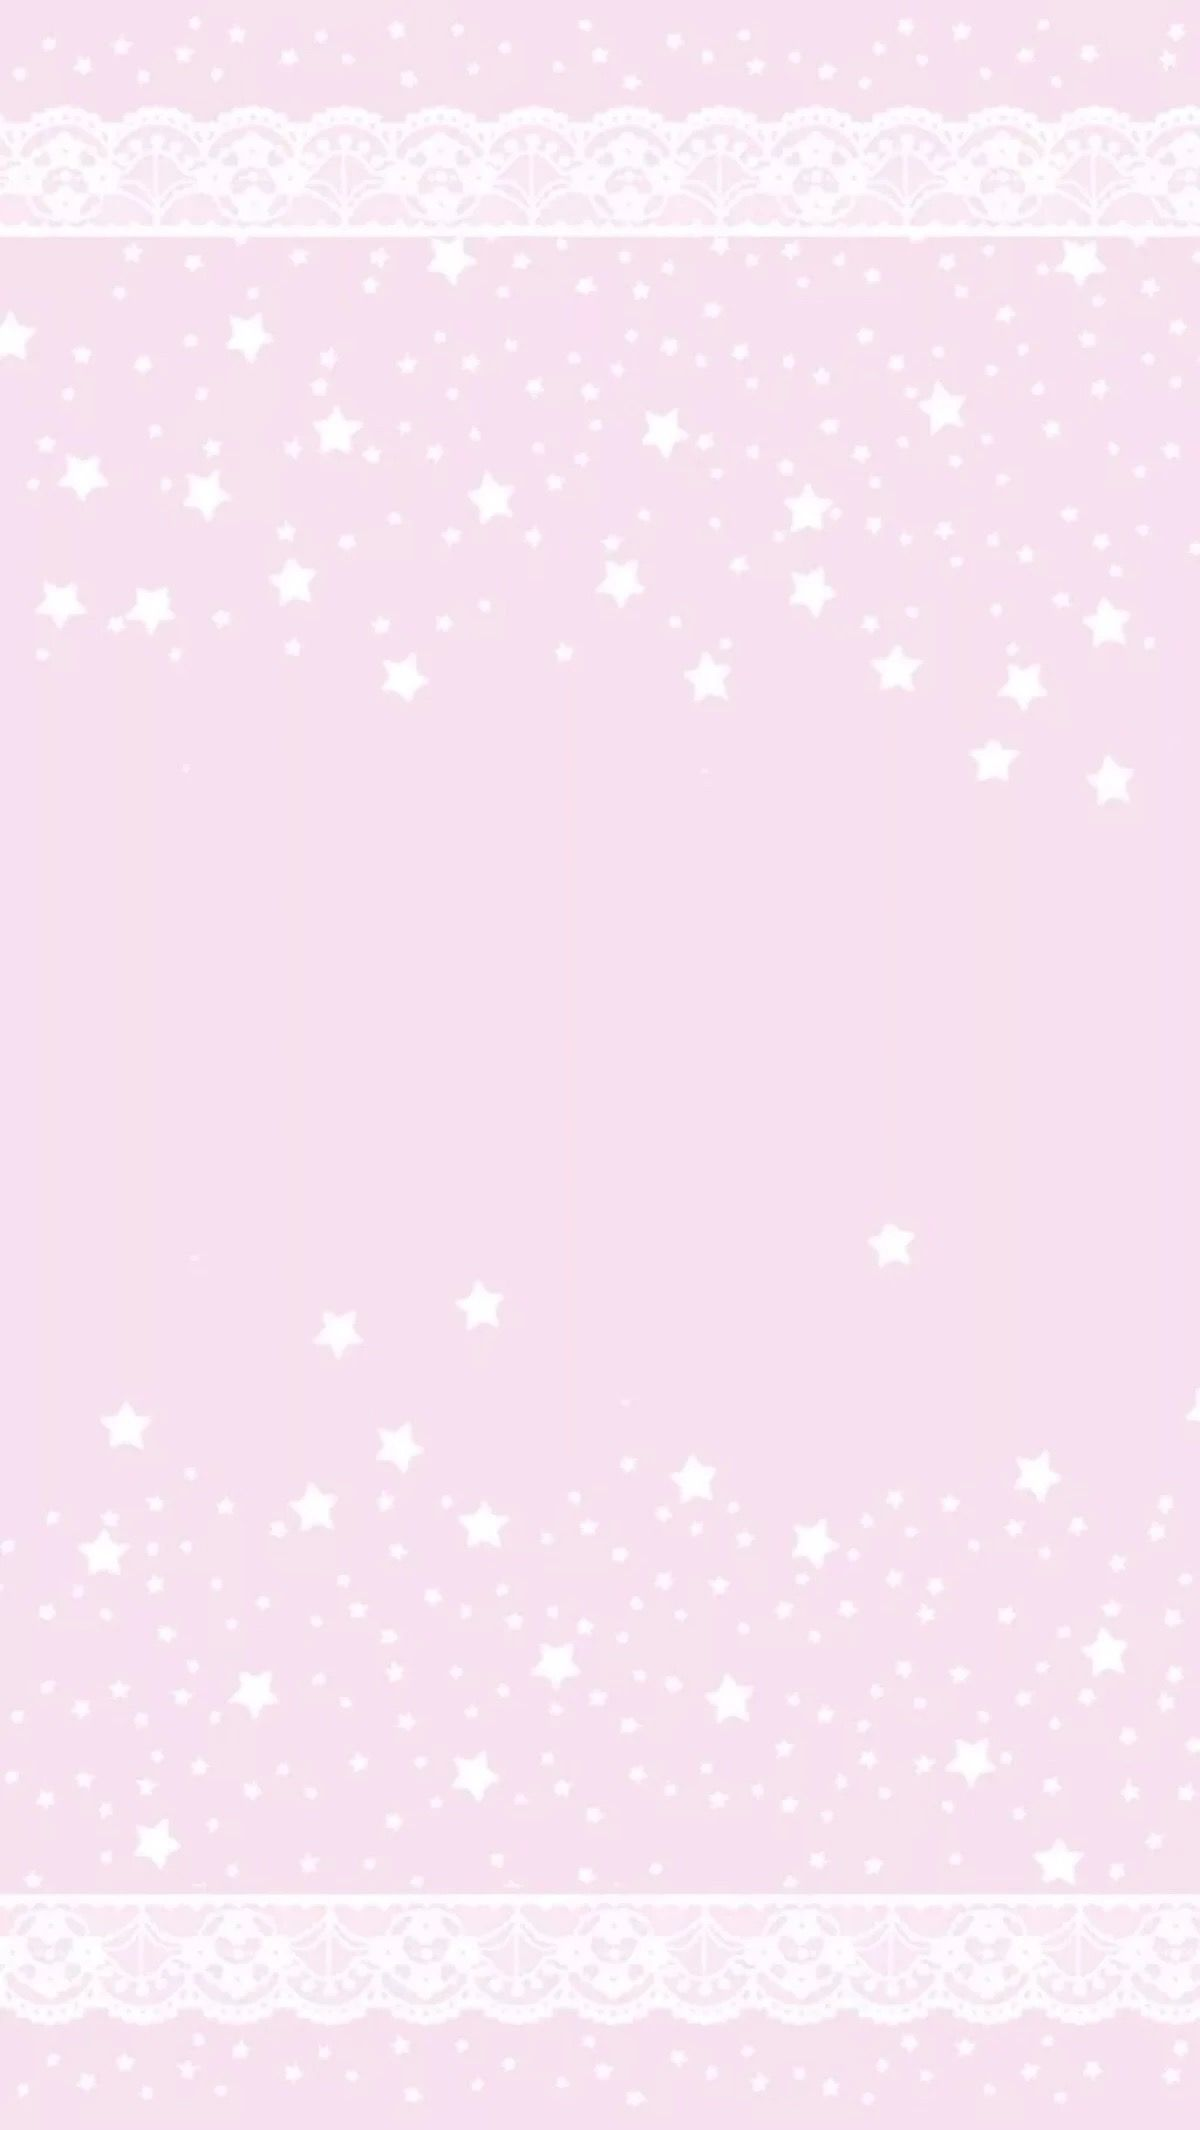 Kawaii Pastel Pink Background : kawaii, pastel, background, Giuliana, Saldivia, Wallpaper, Kawaii, Wallpaper,